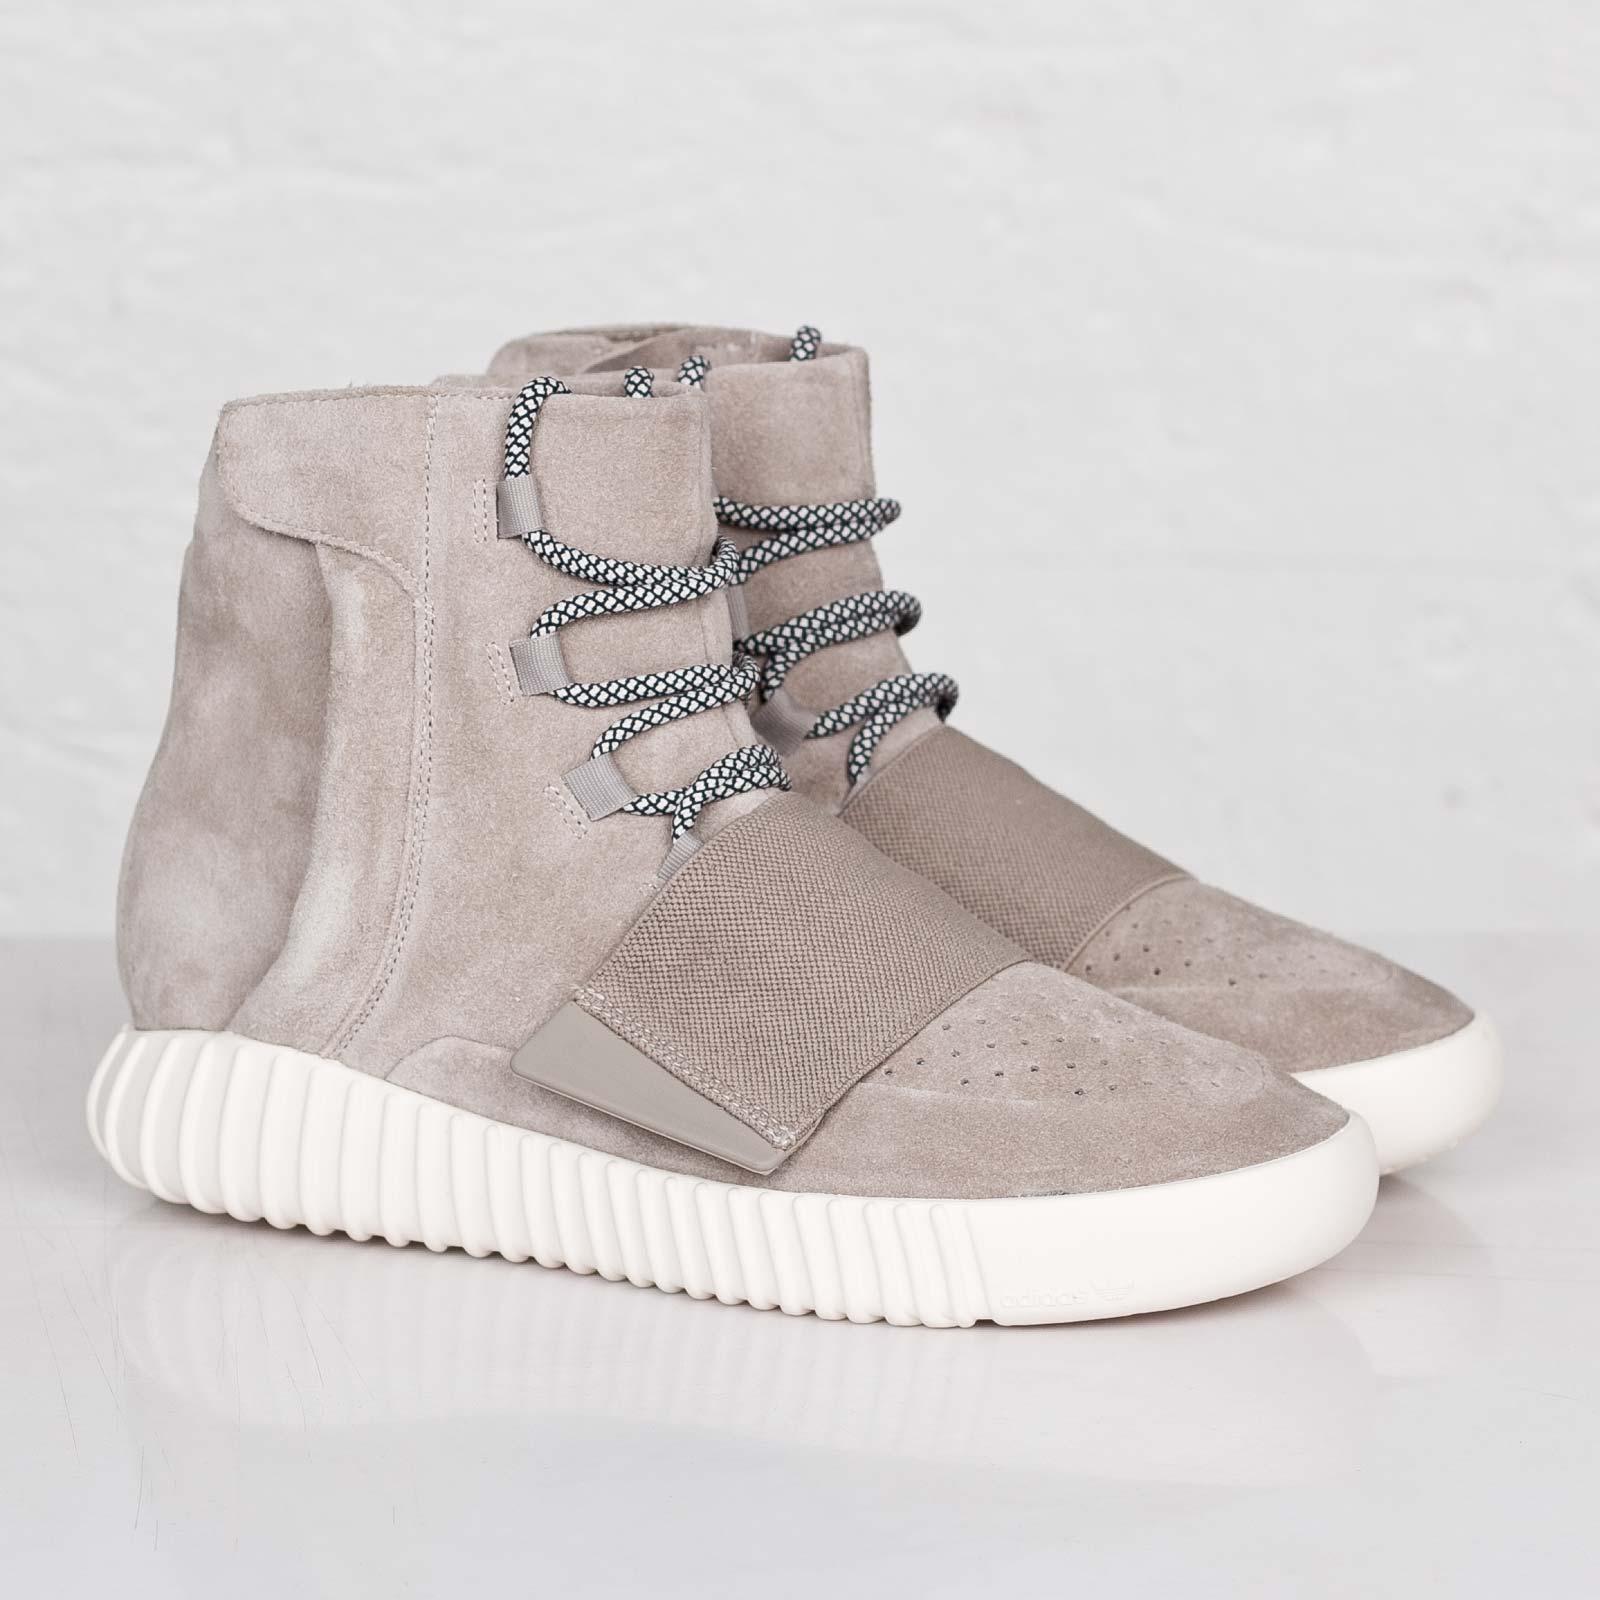 fc629d31557b5 adidas Yeezy 750 Boost - B35309 - Sneakersnstuff